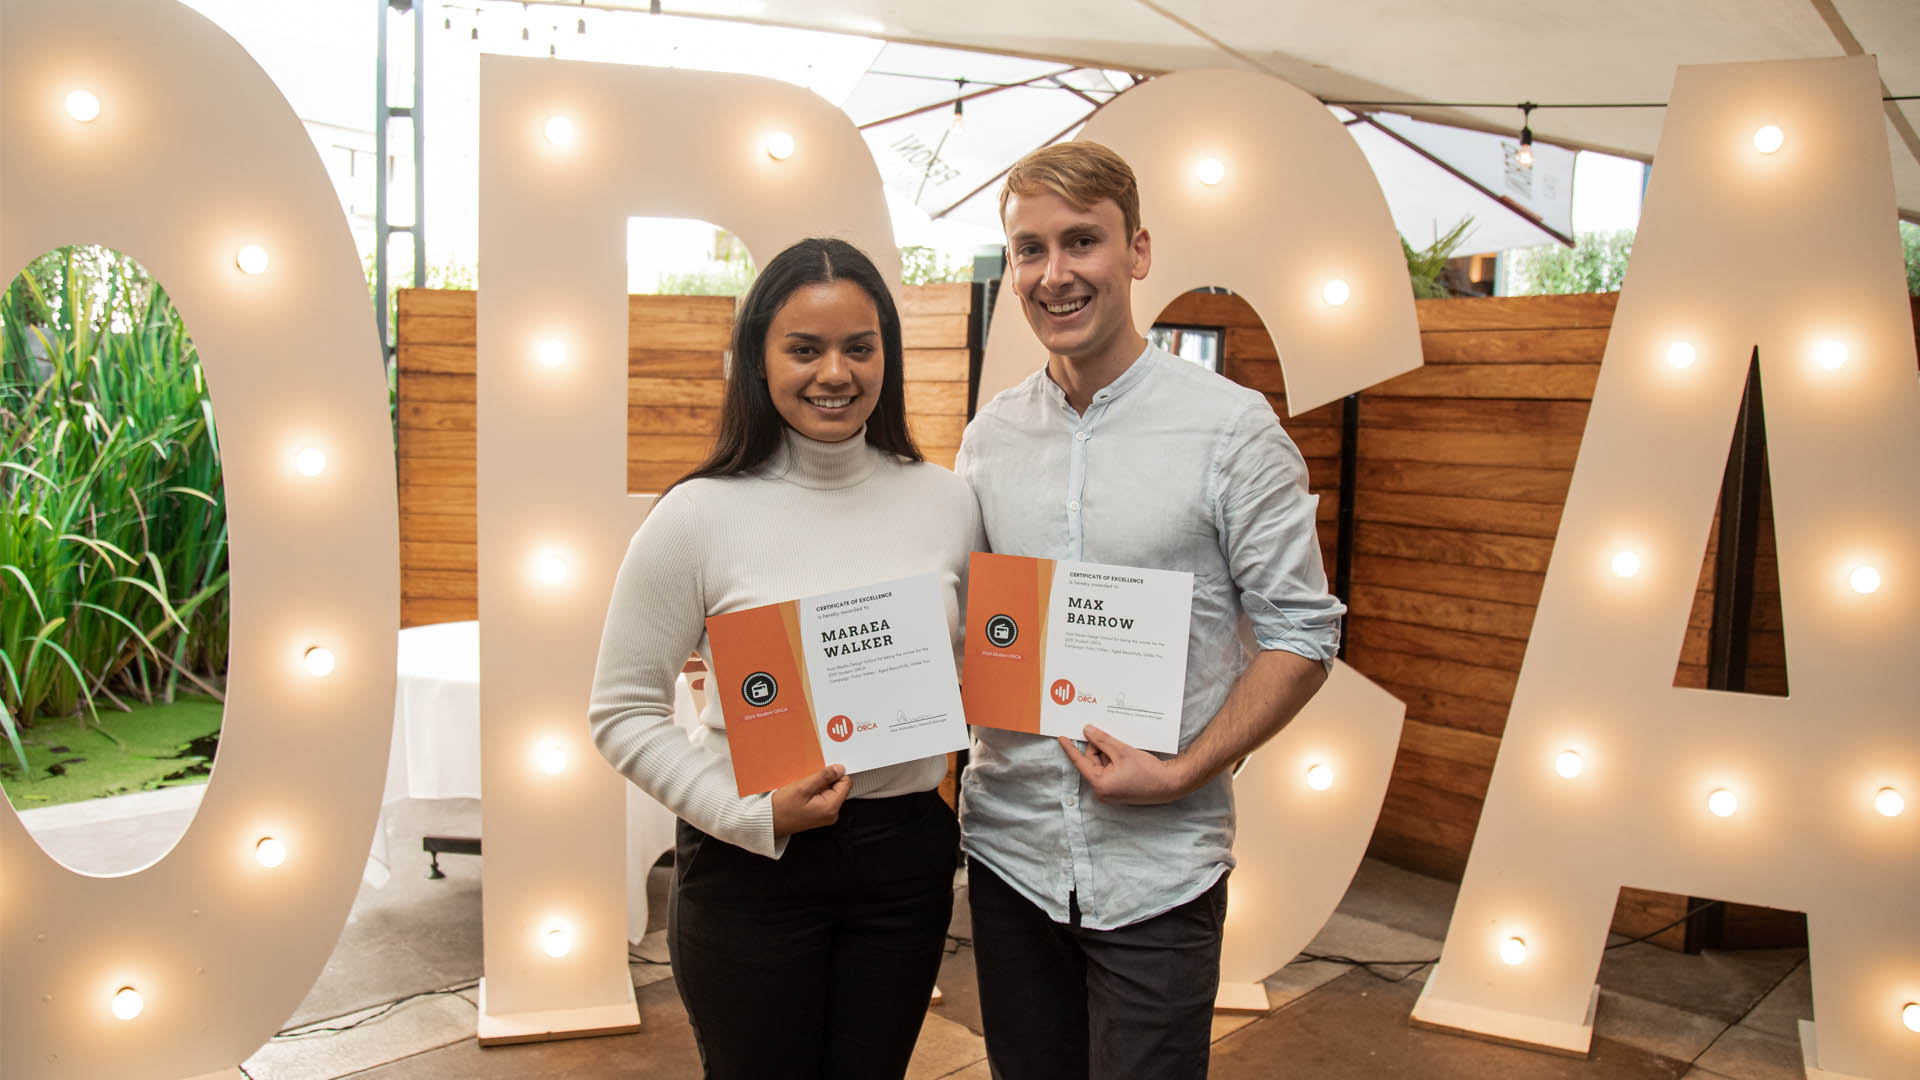 Media Design School's  Maraea Walker and Max Barrow named winners of TRB Student ORCA